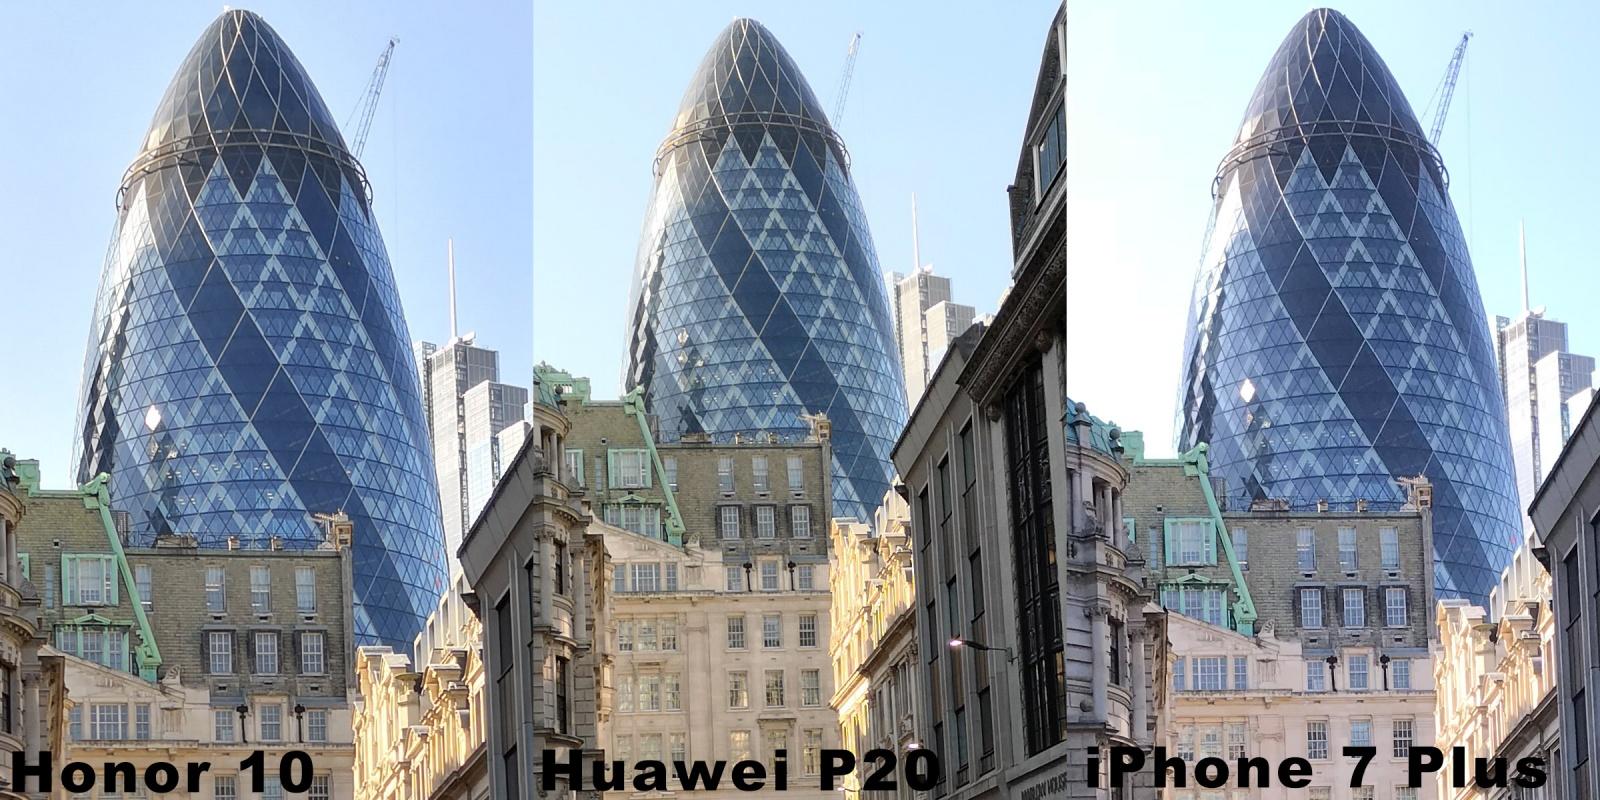 Как фотографирует новый Honor 10. Сравниваем с Huawei P20 и iPhone 7 Plus - 19